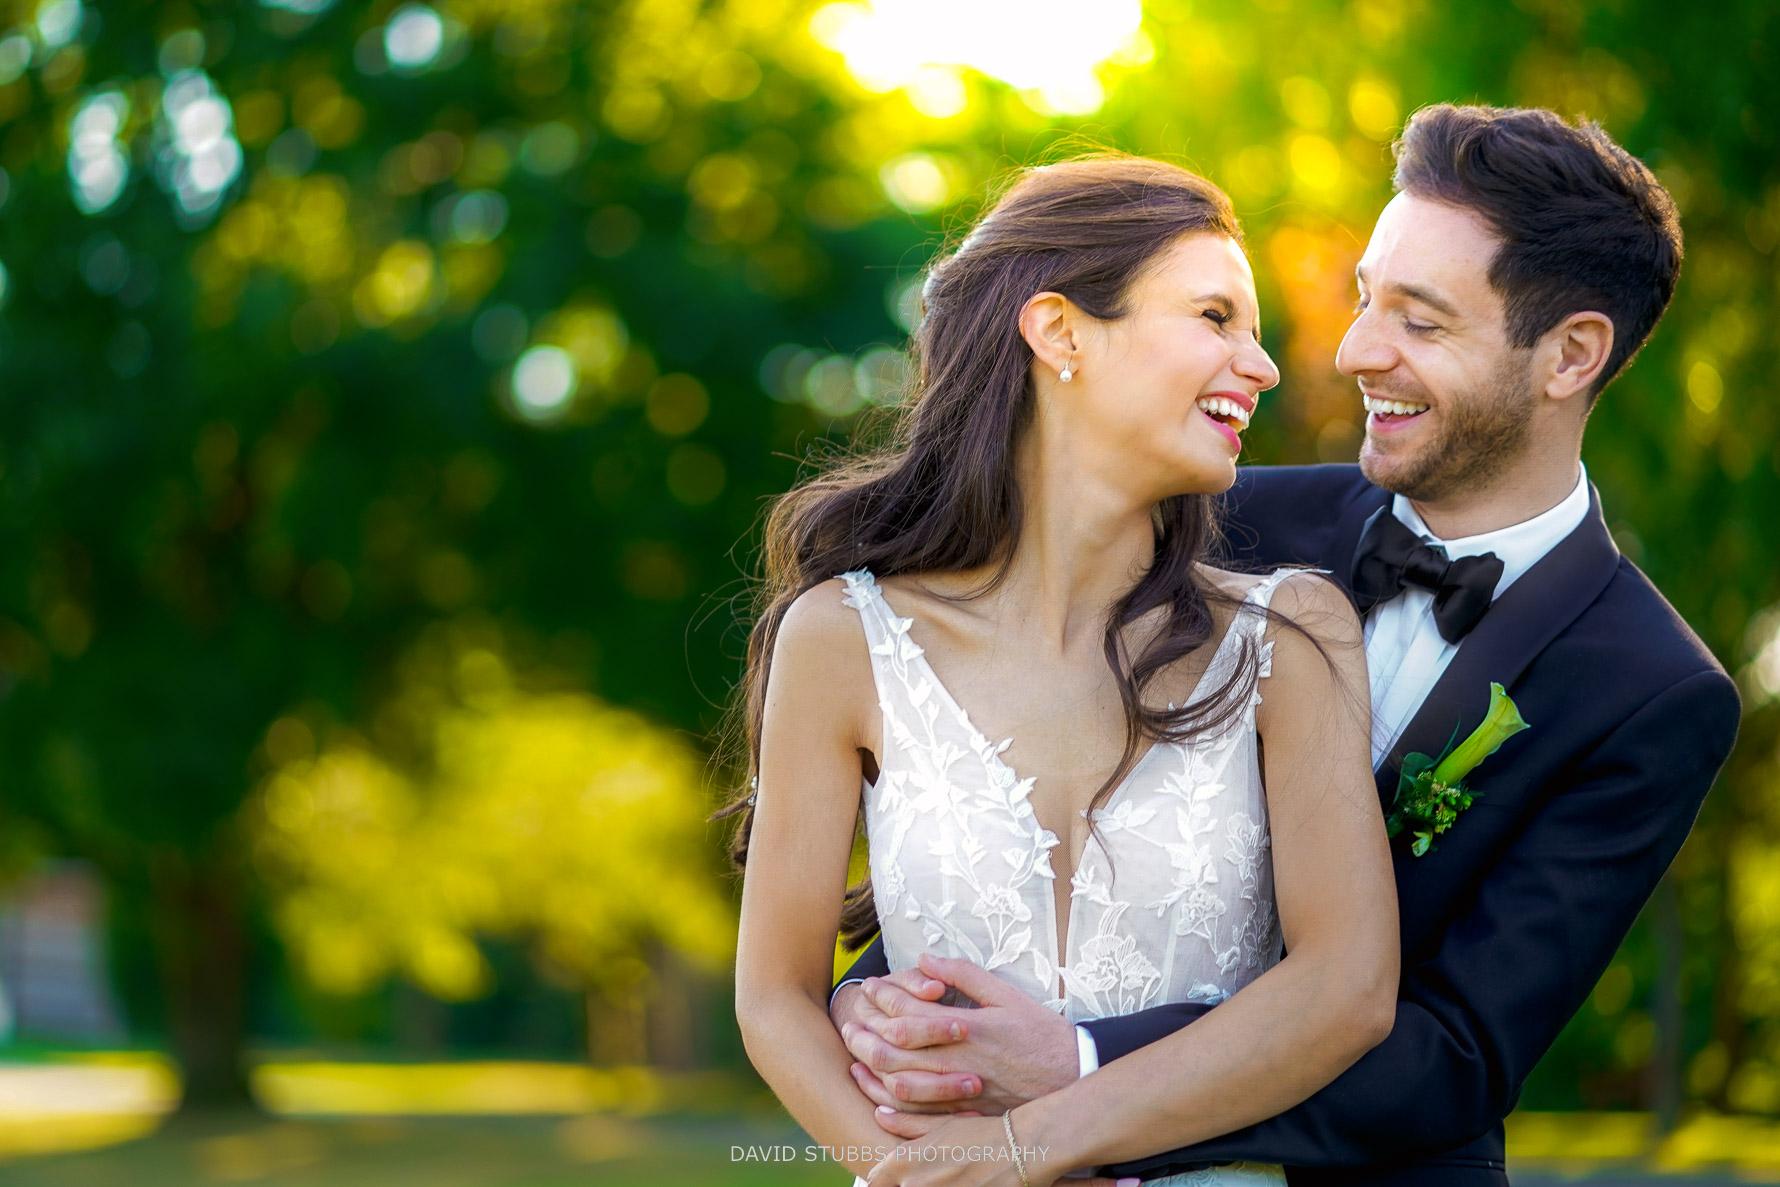 couple together, jewish wedding